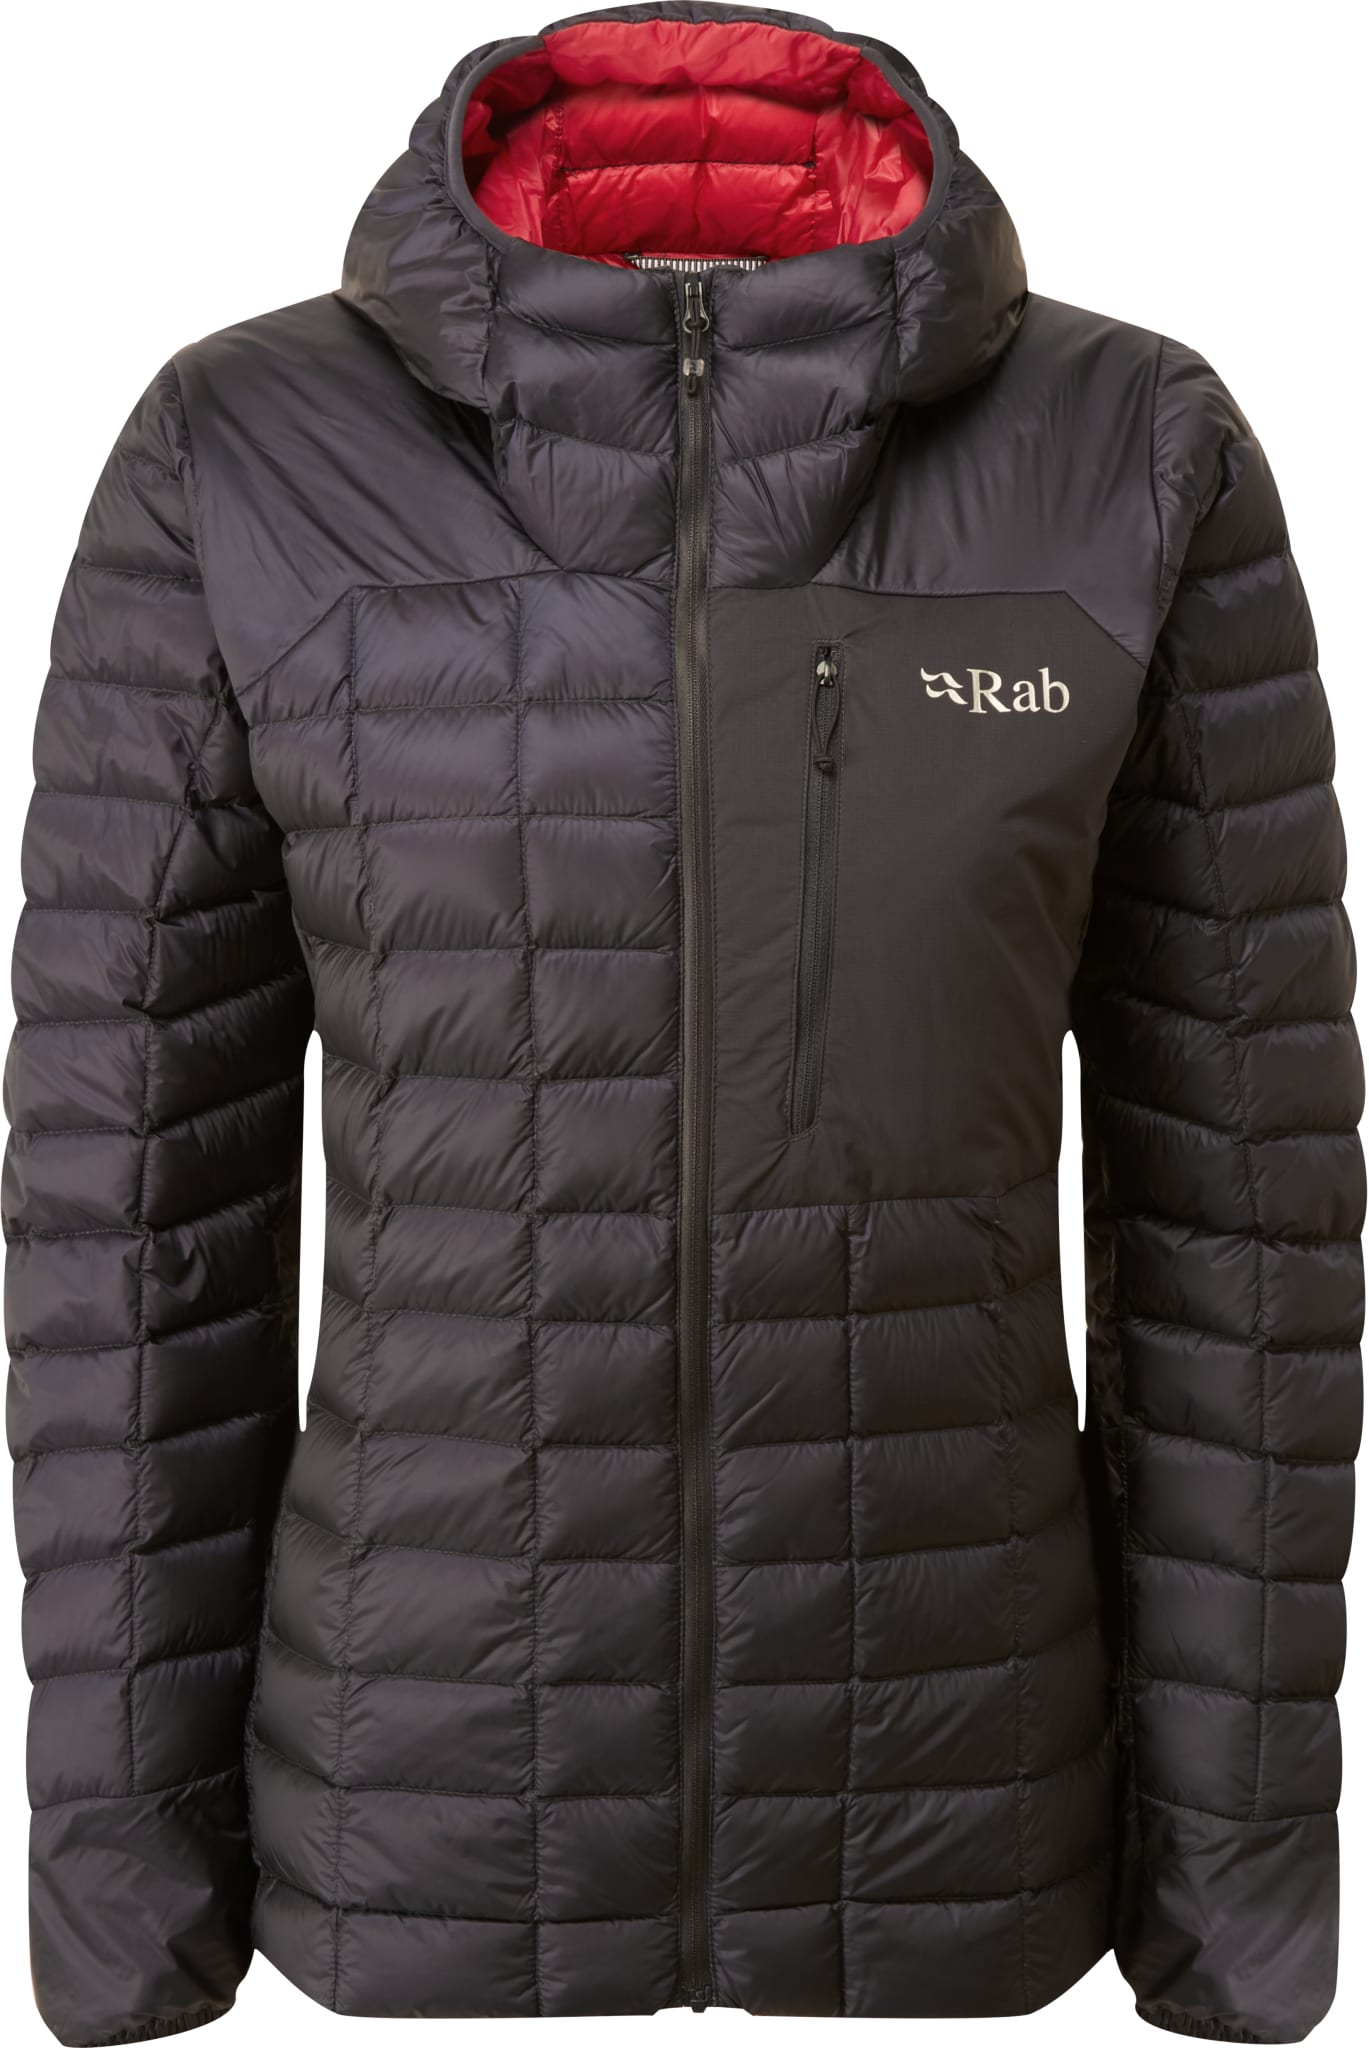 Kaon Jacket Ws